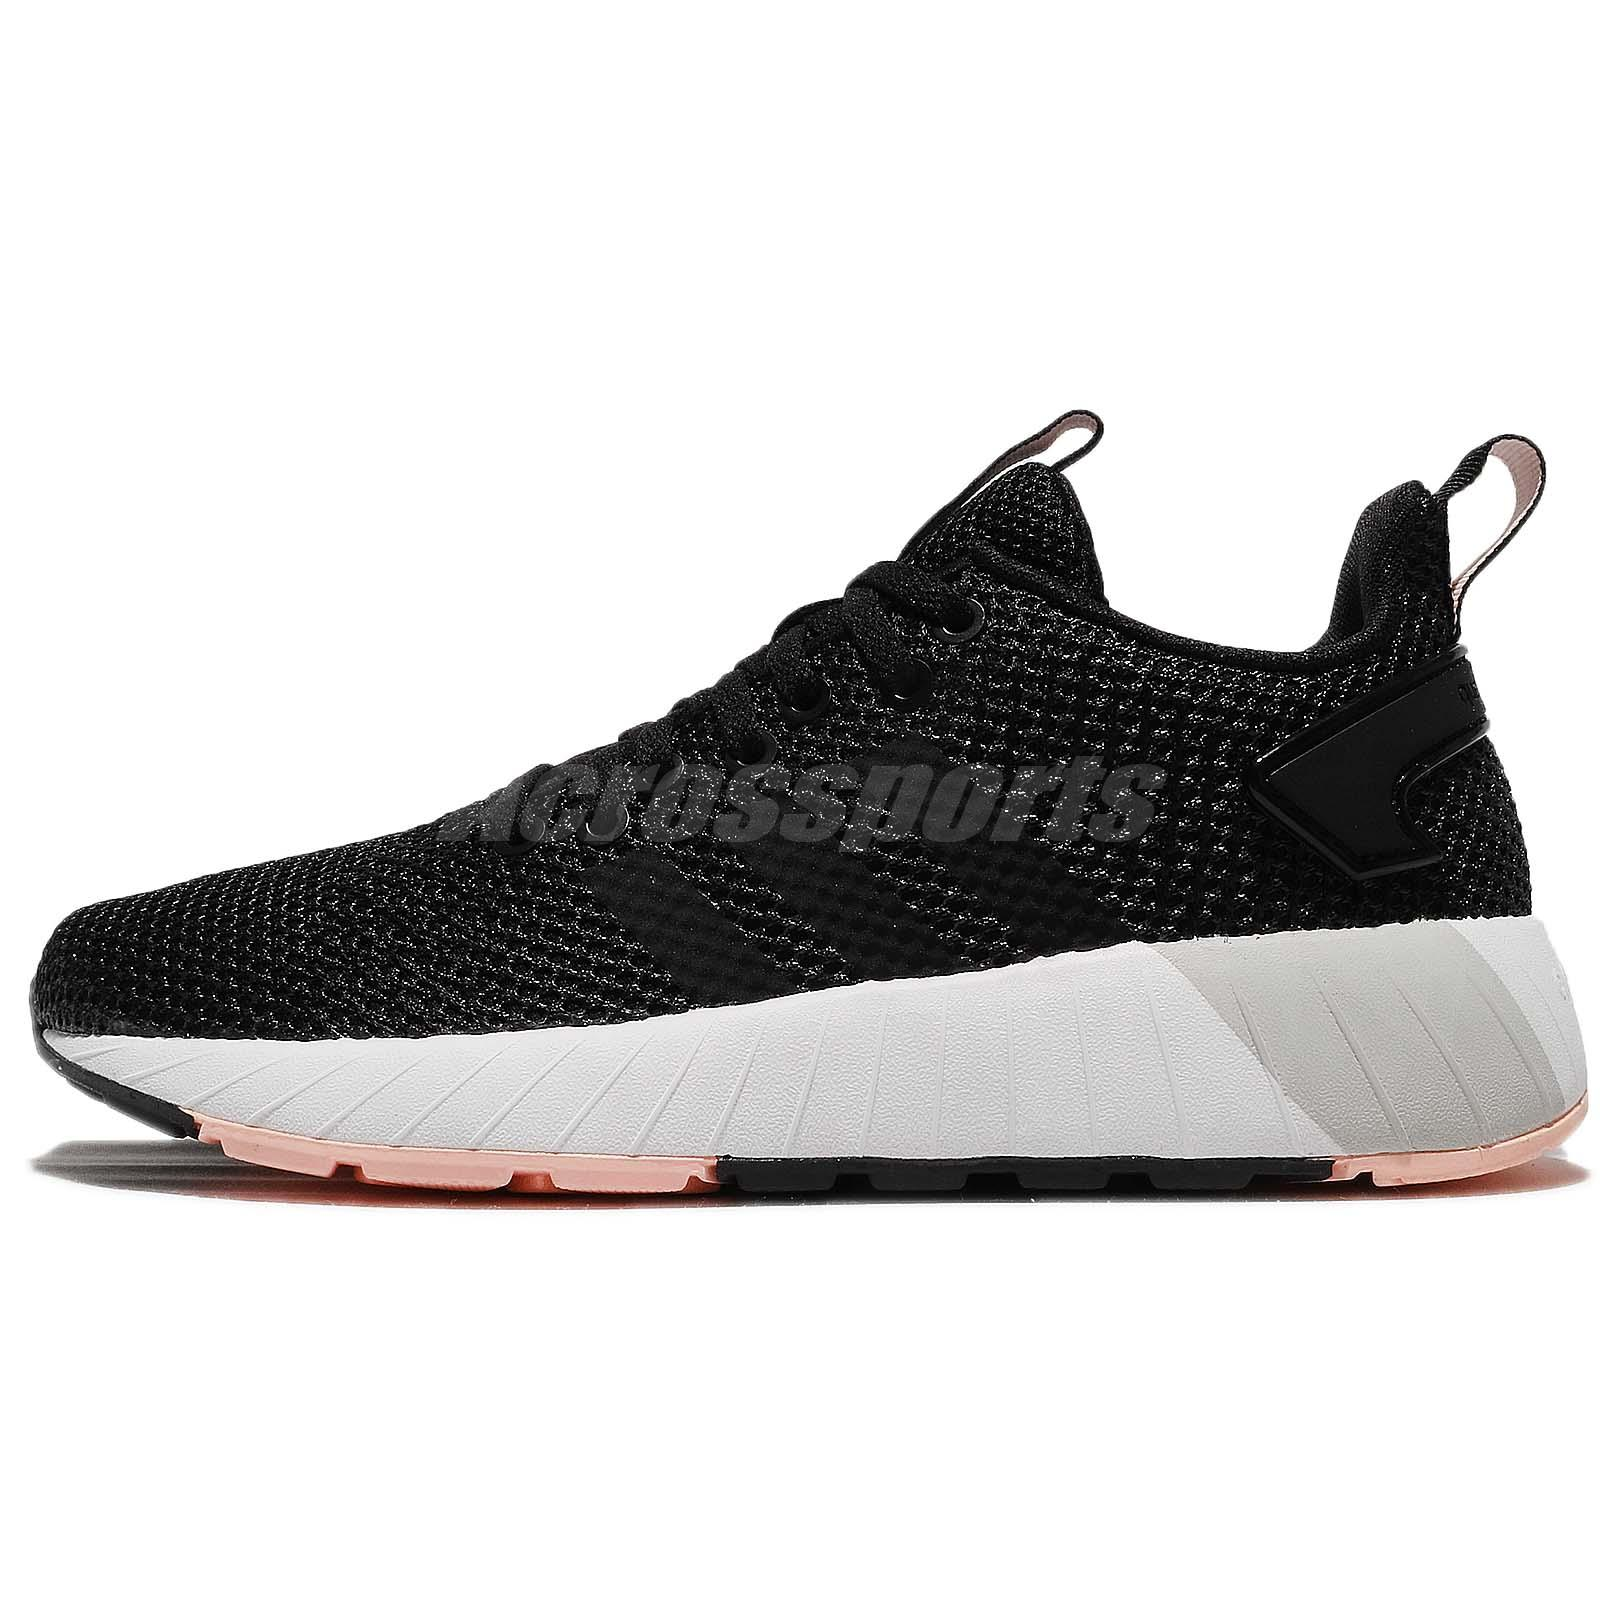 Adidas Running Shoes On Ebay